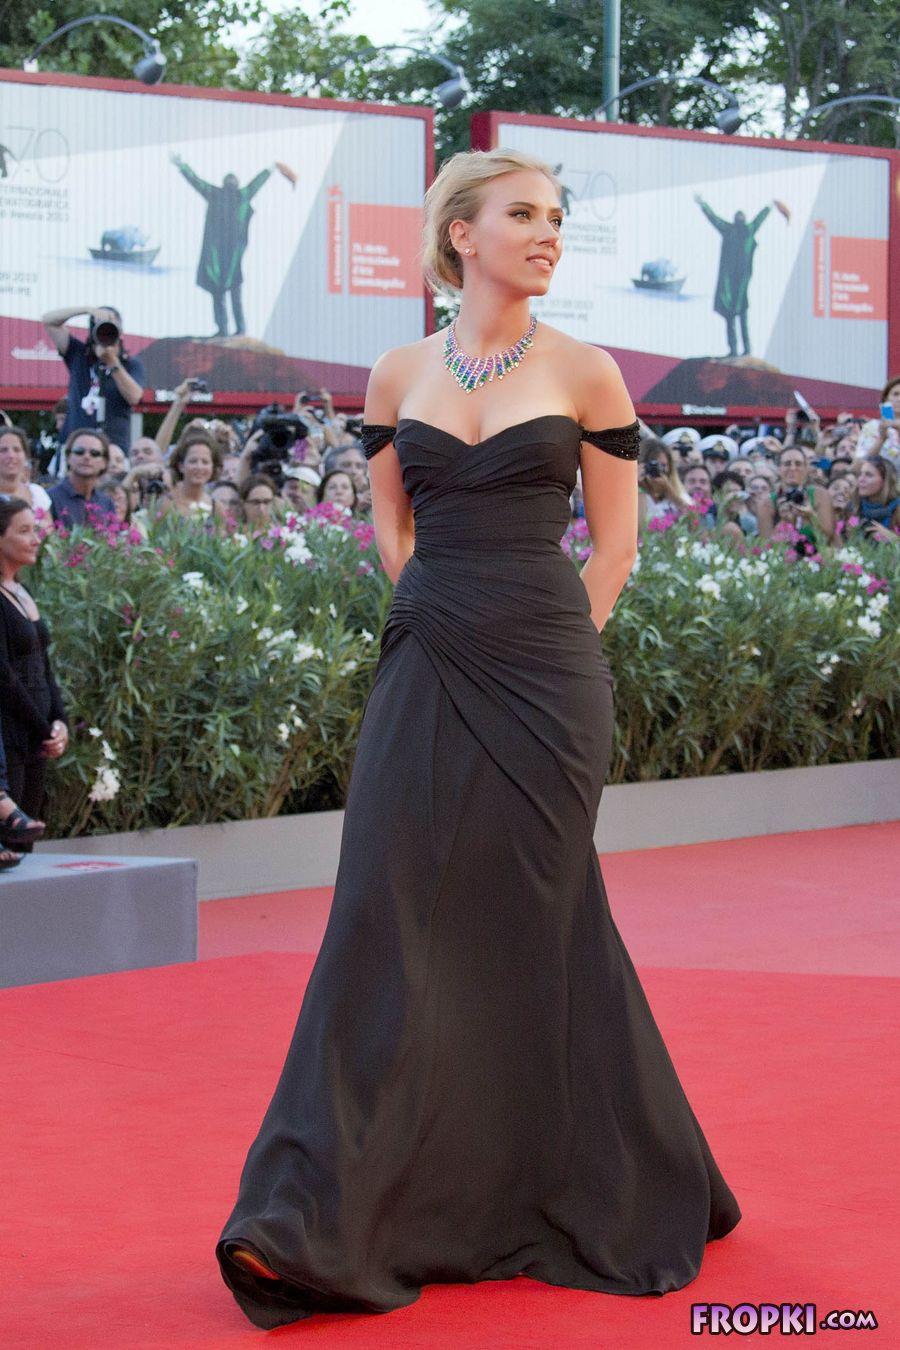 Scarlett Johansson Fropki 24